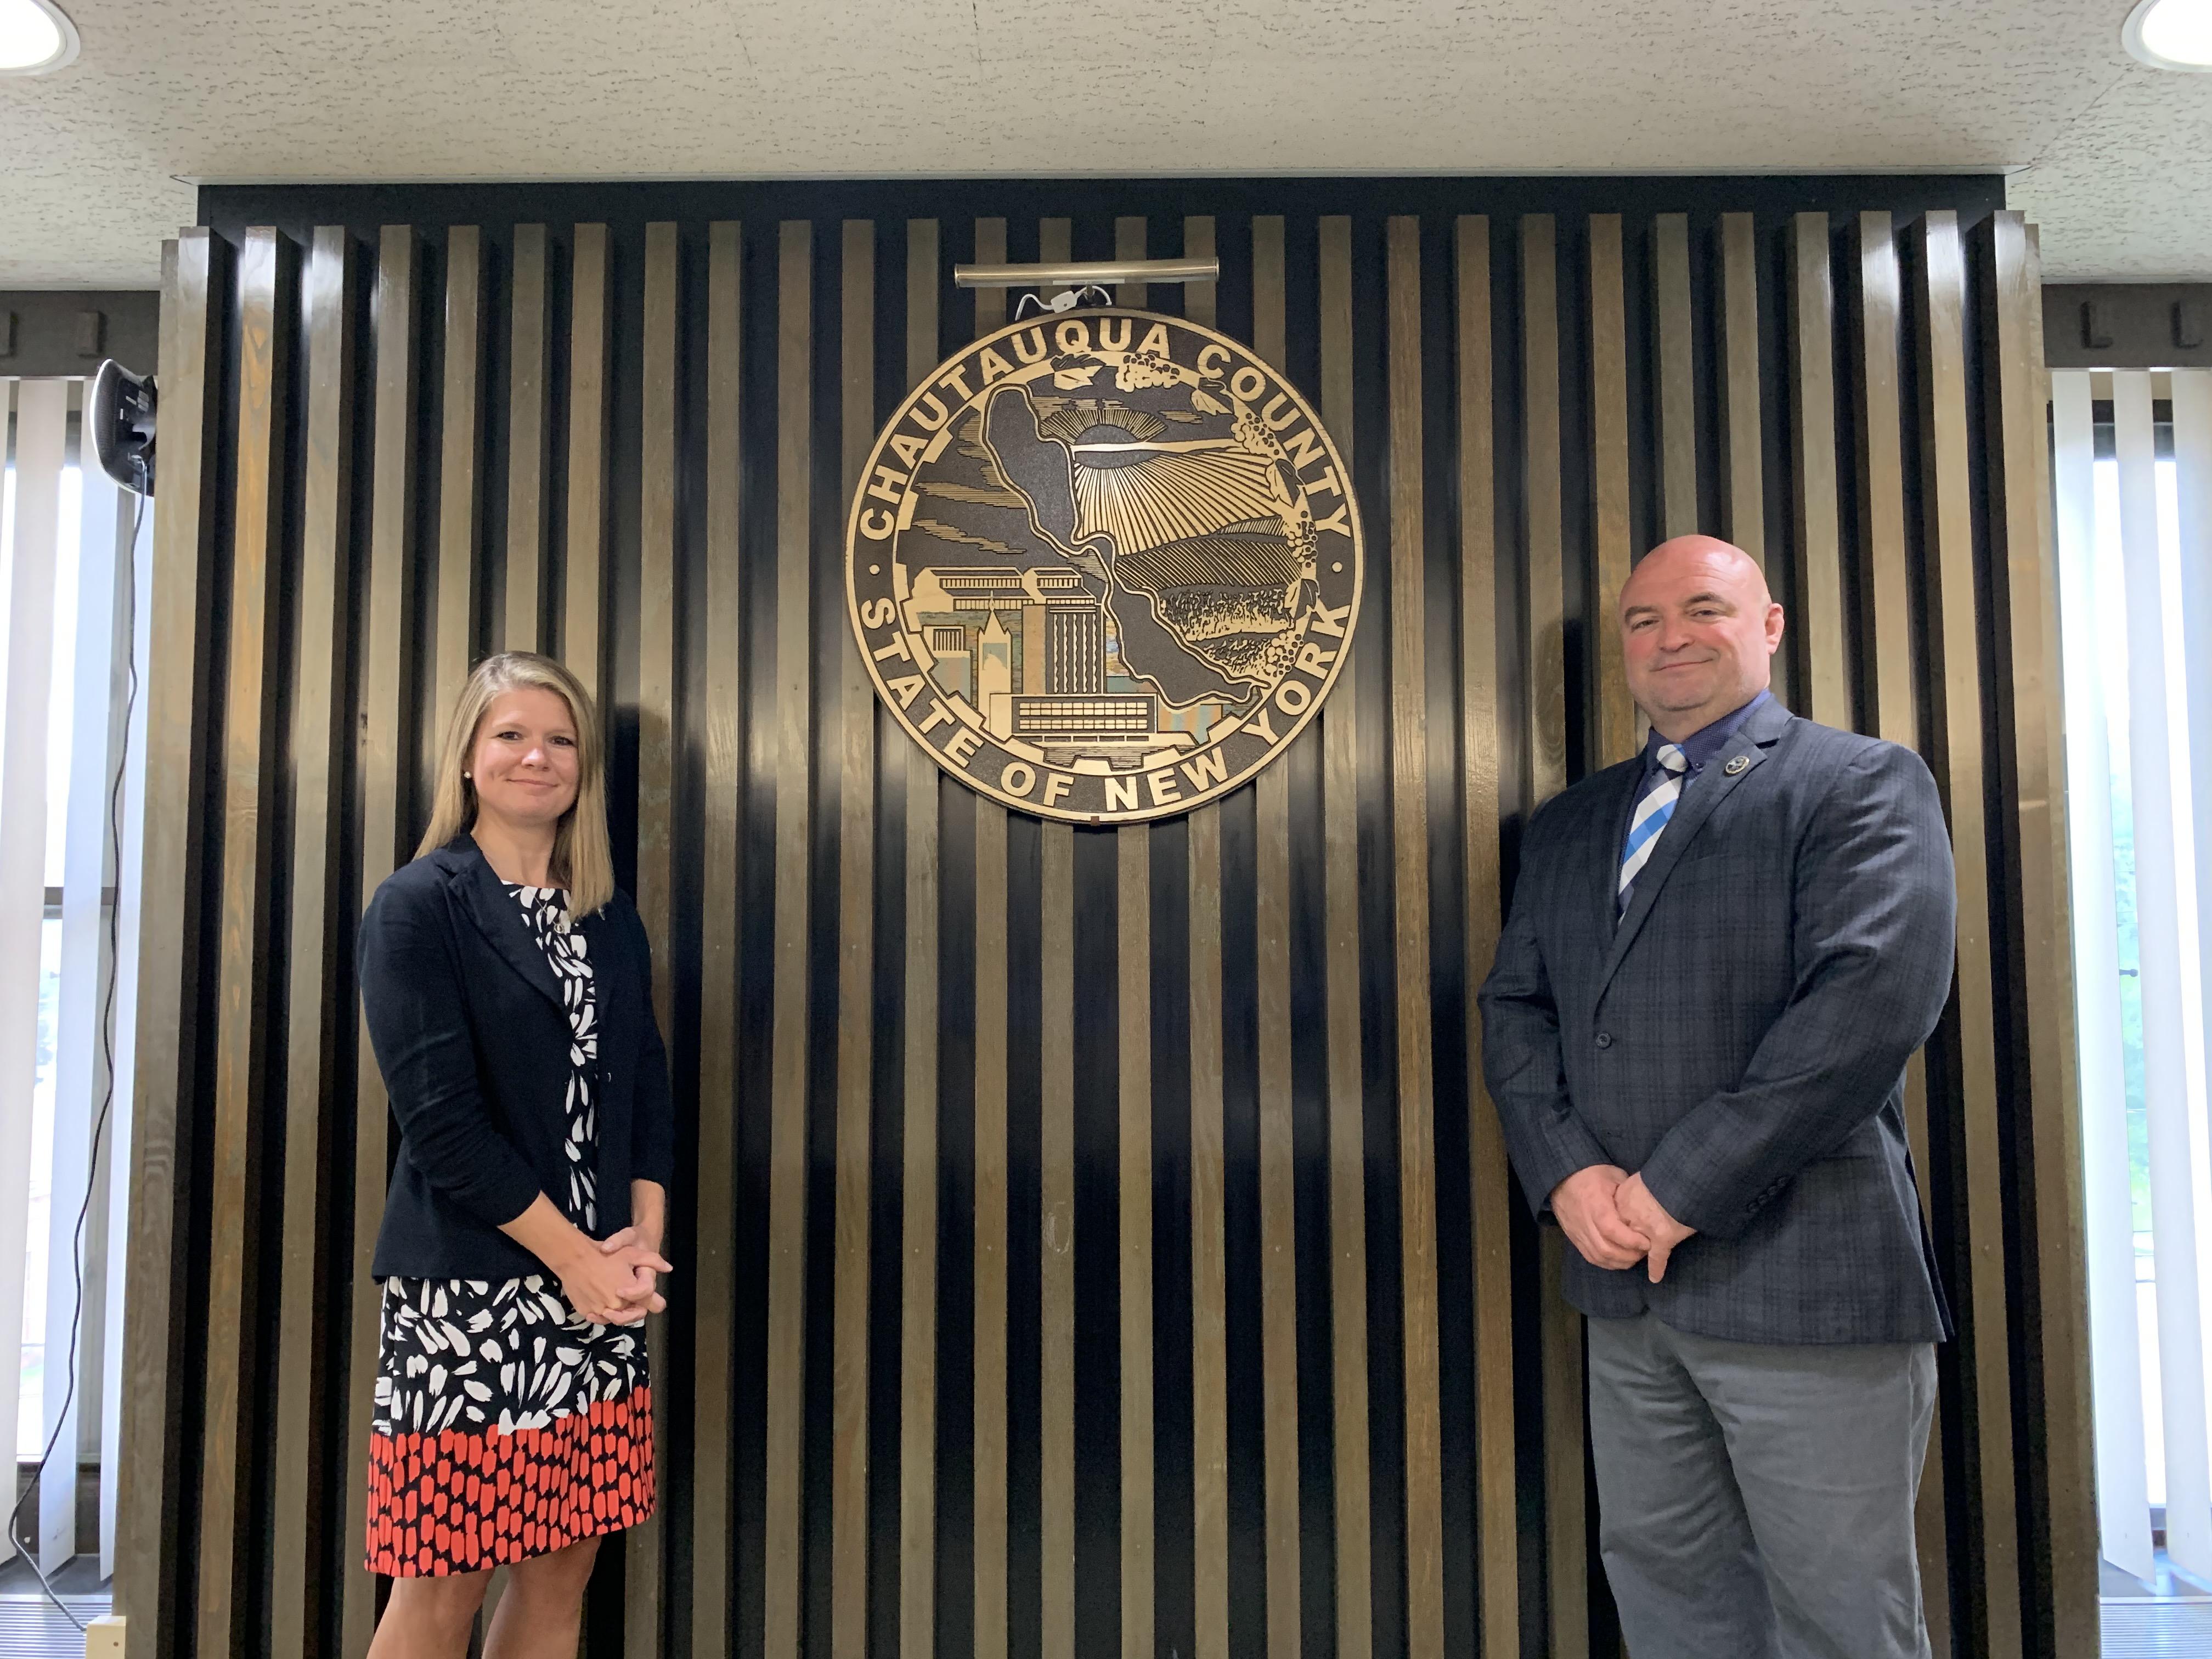 Outgoing Chautauqua County Human Resources Director Jessica Wisniewski (left), and Chautauqua County Executive PJ Wendel (right).